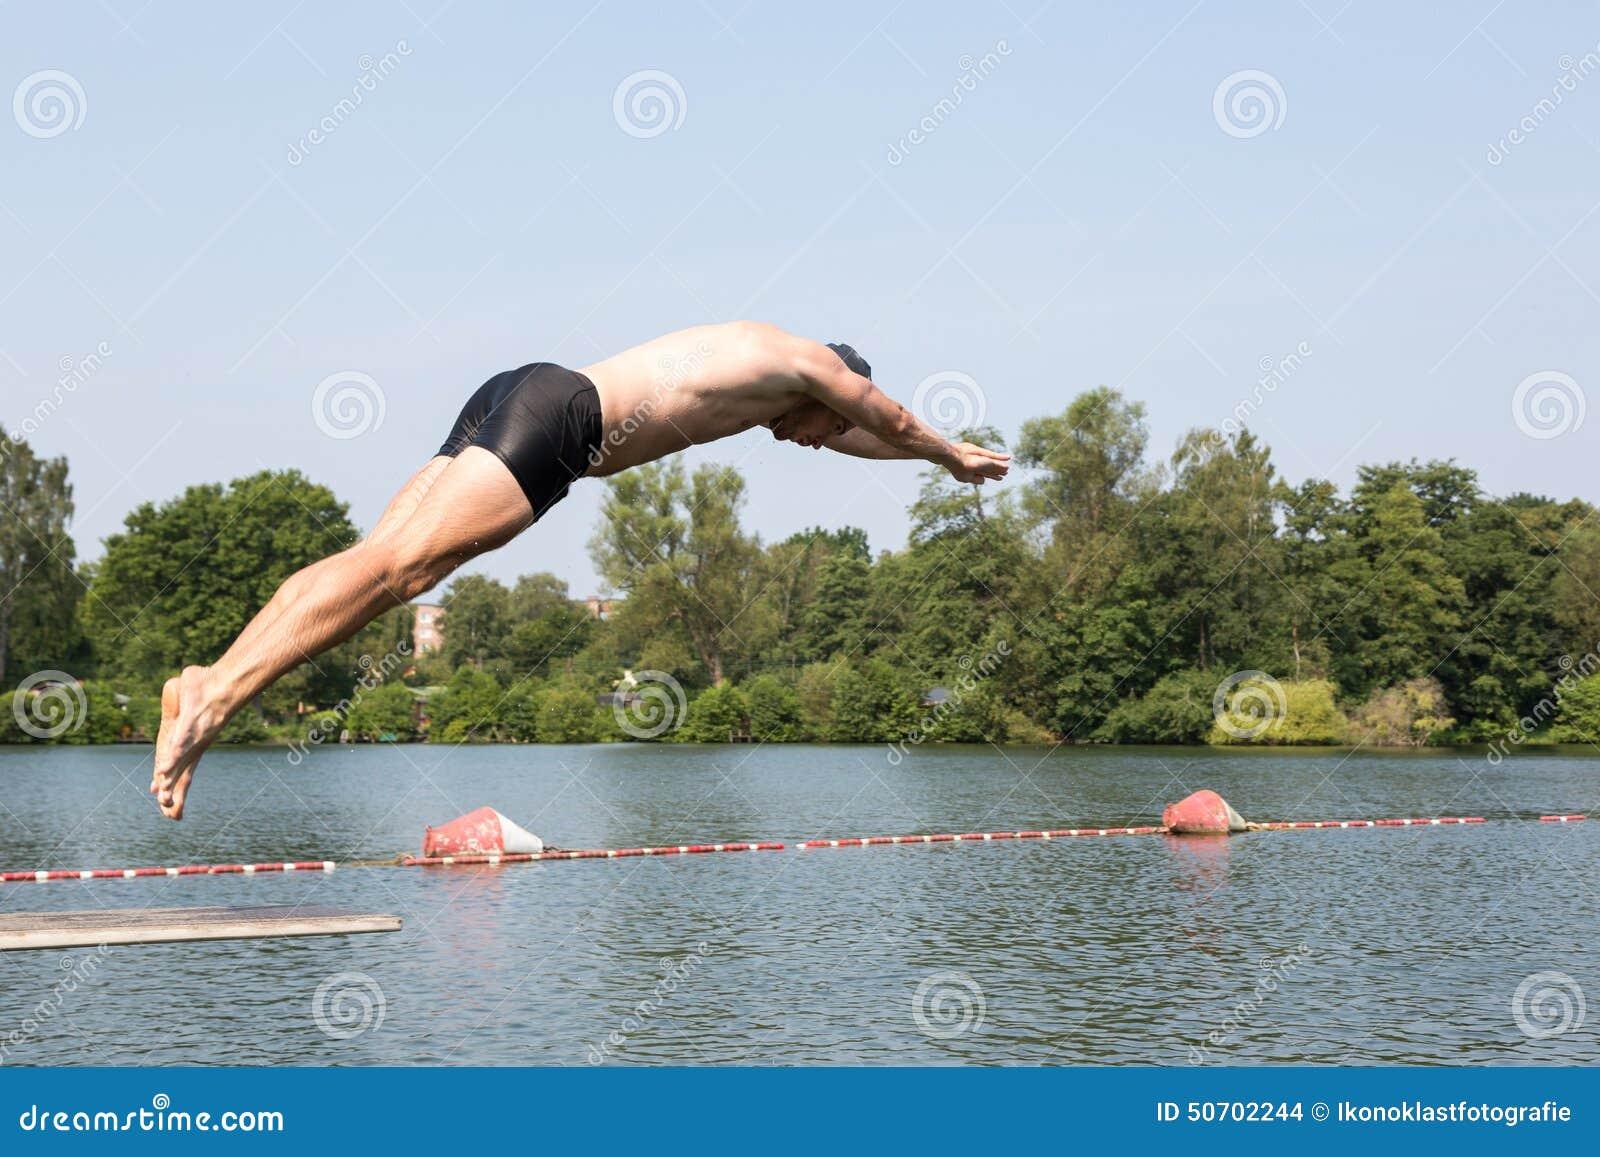 Man Jumping Off Diving Board At Swimming Pool Stock Image 50702239